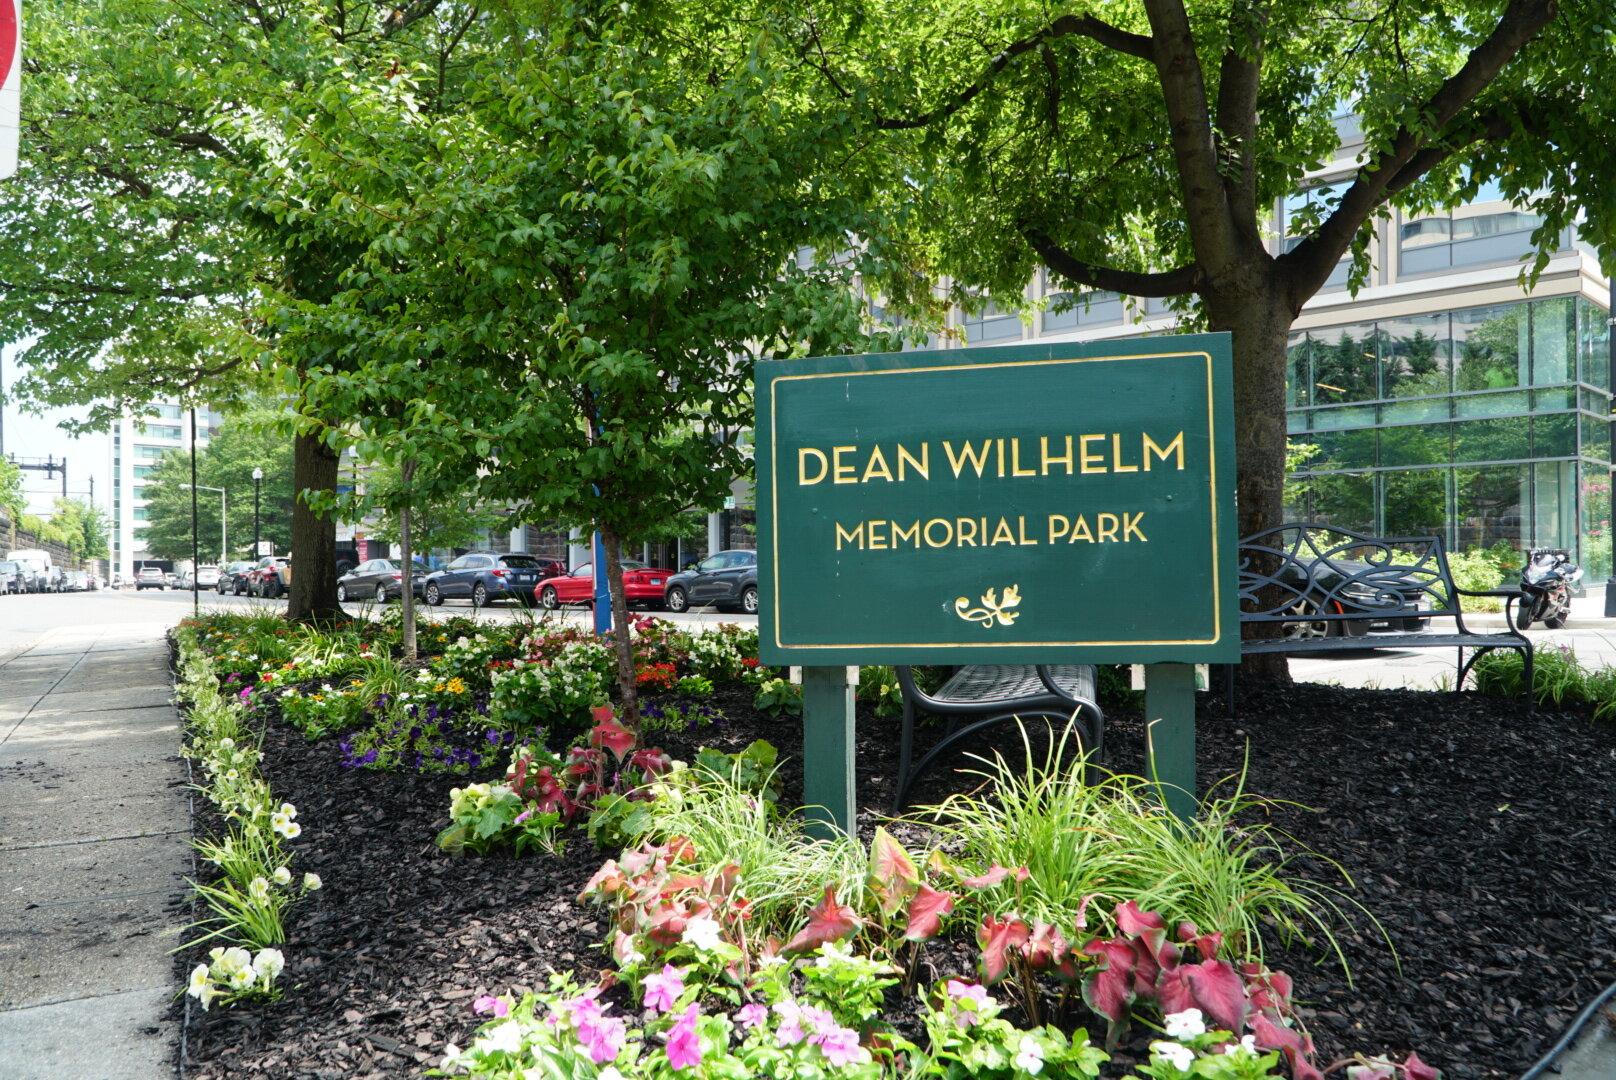 Dean Wilhem Memorial Park Landscaping